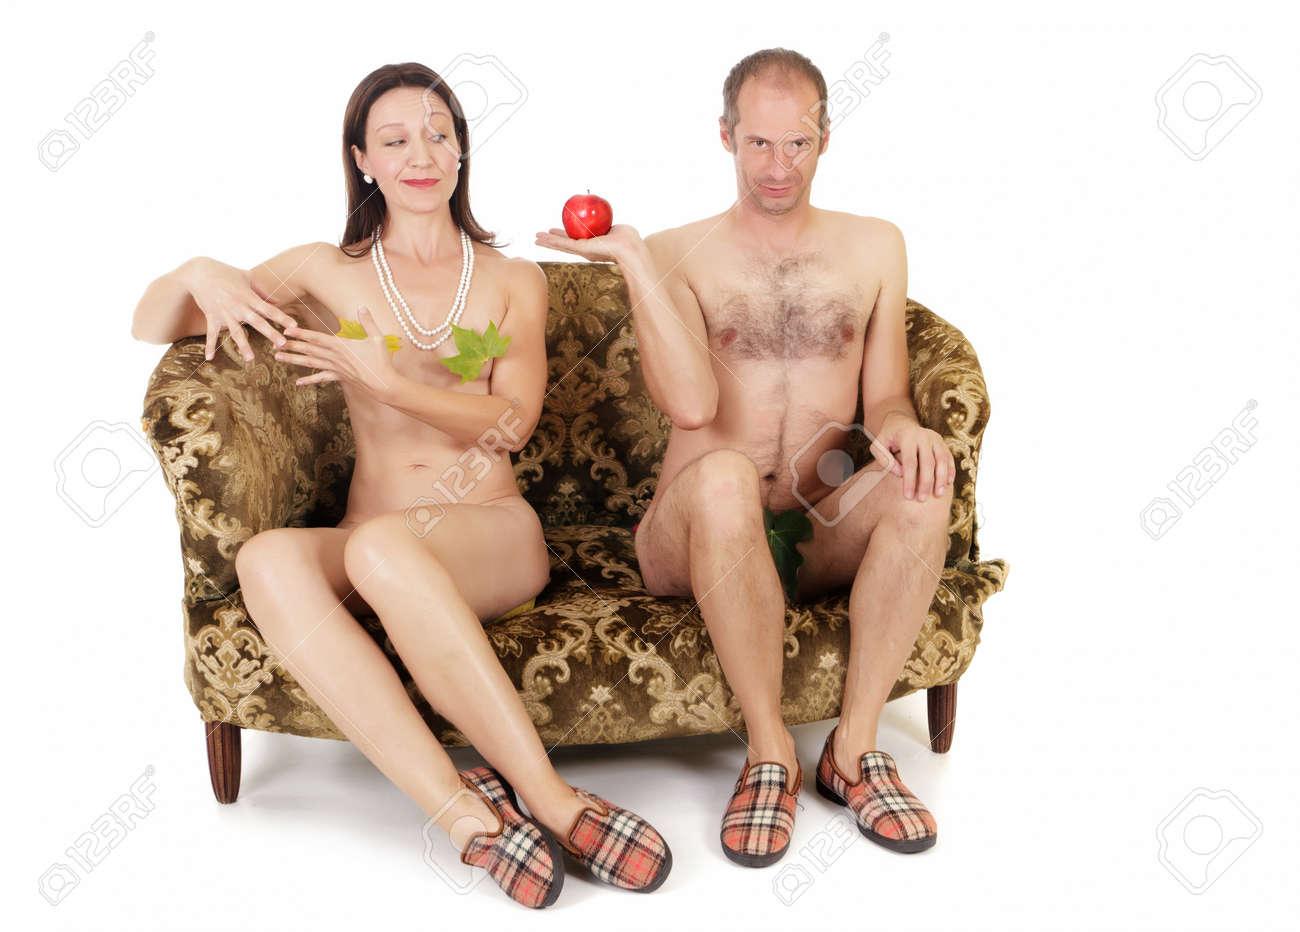 голые ретро пары на диване фото